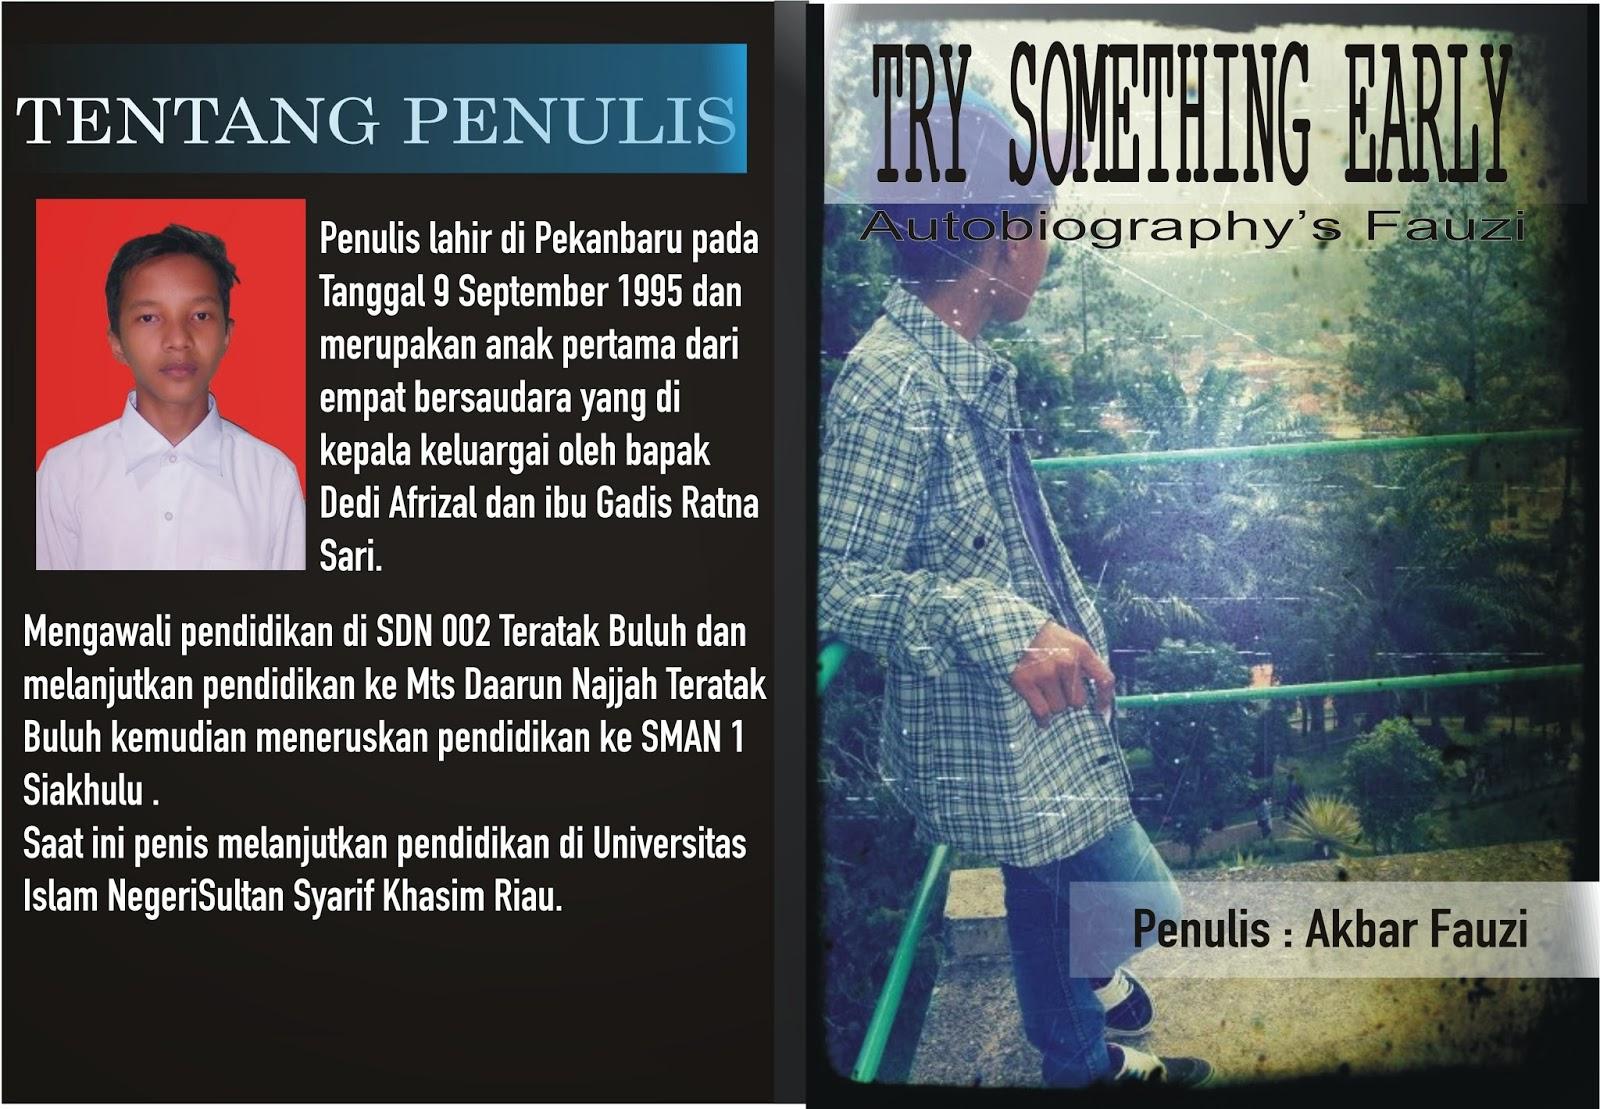 Contoh Cover Buku Autobiografi